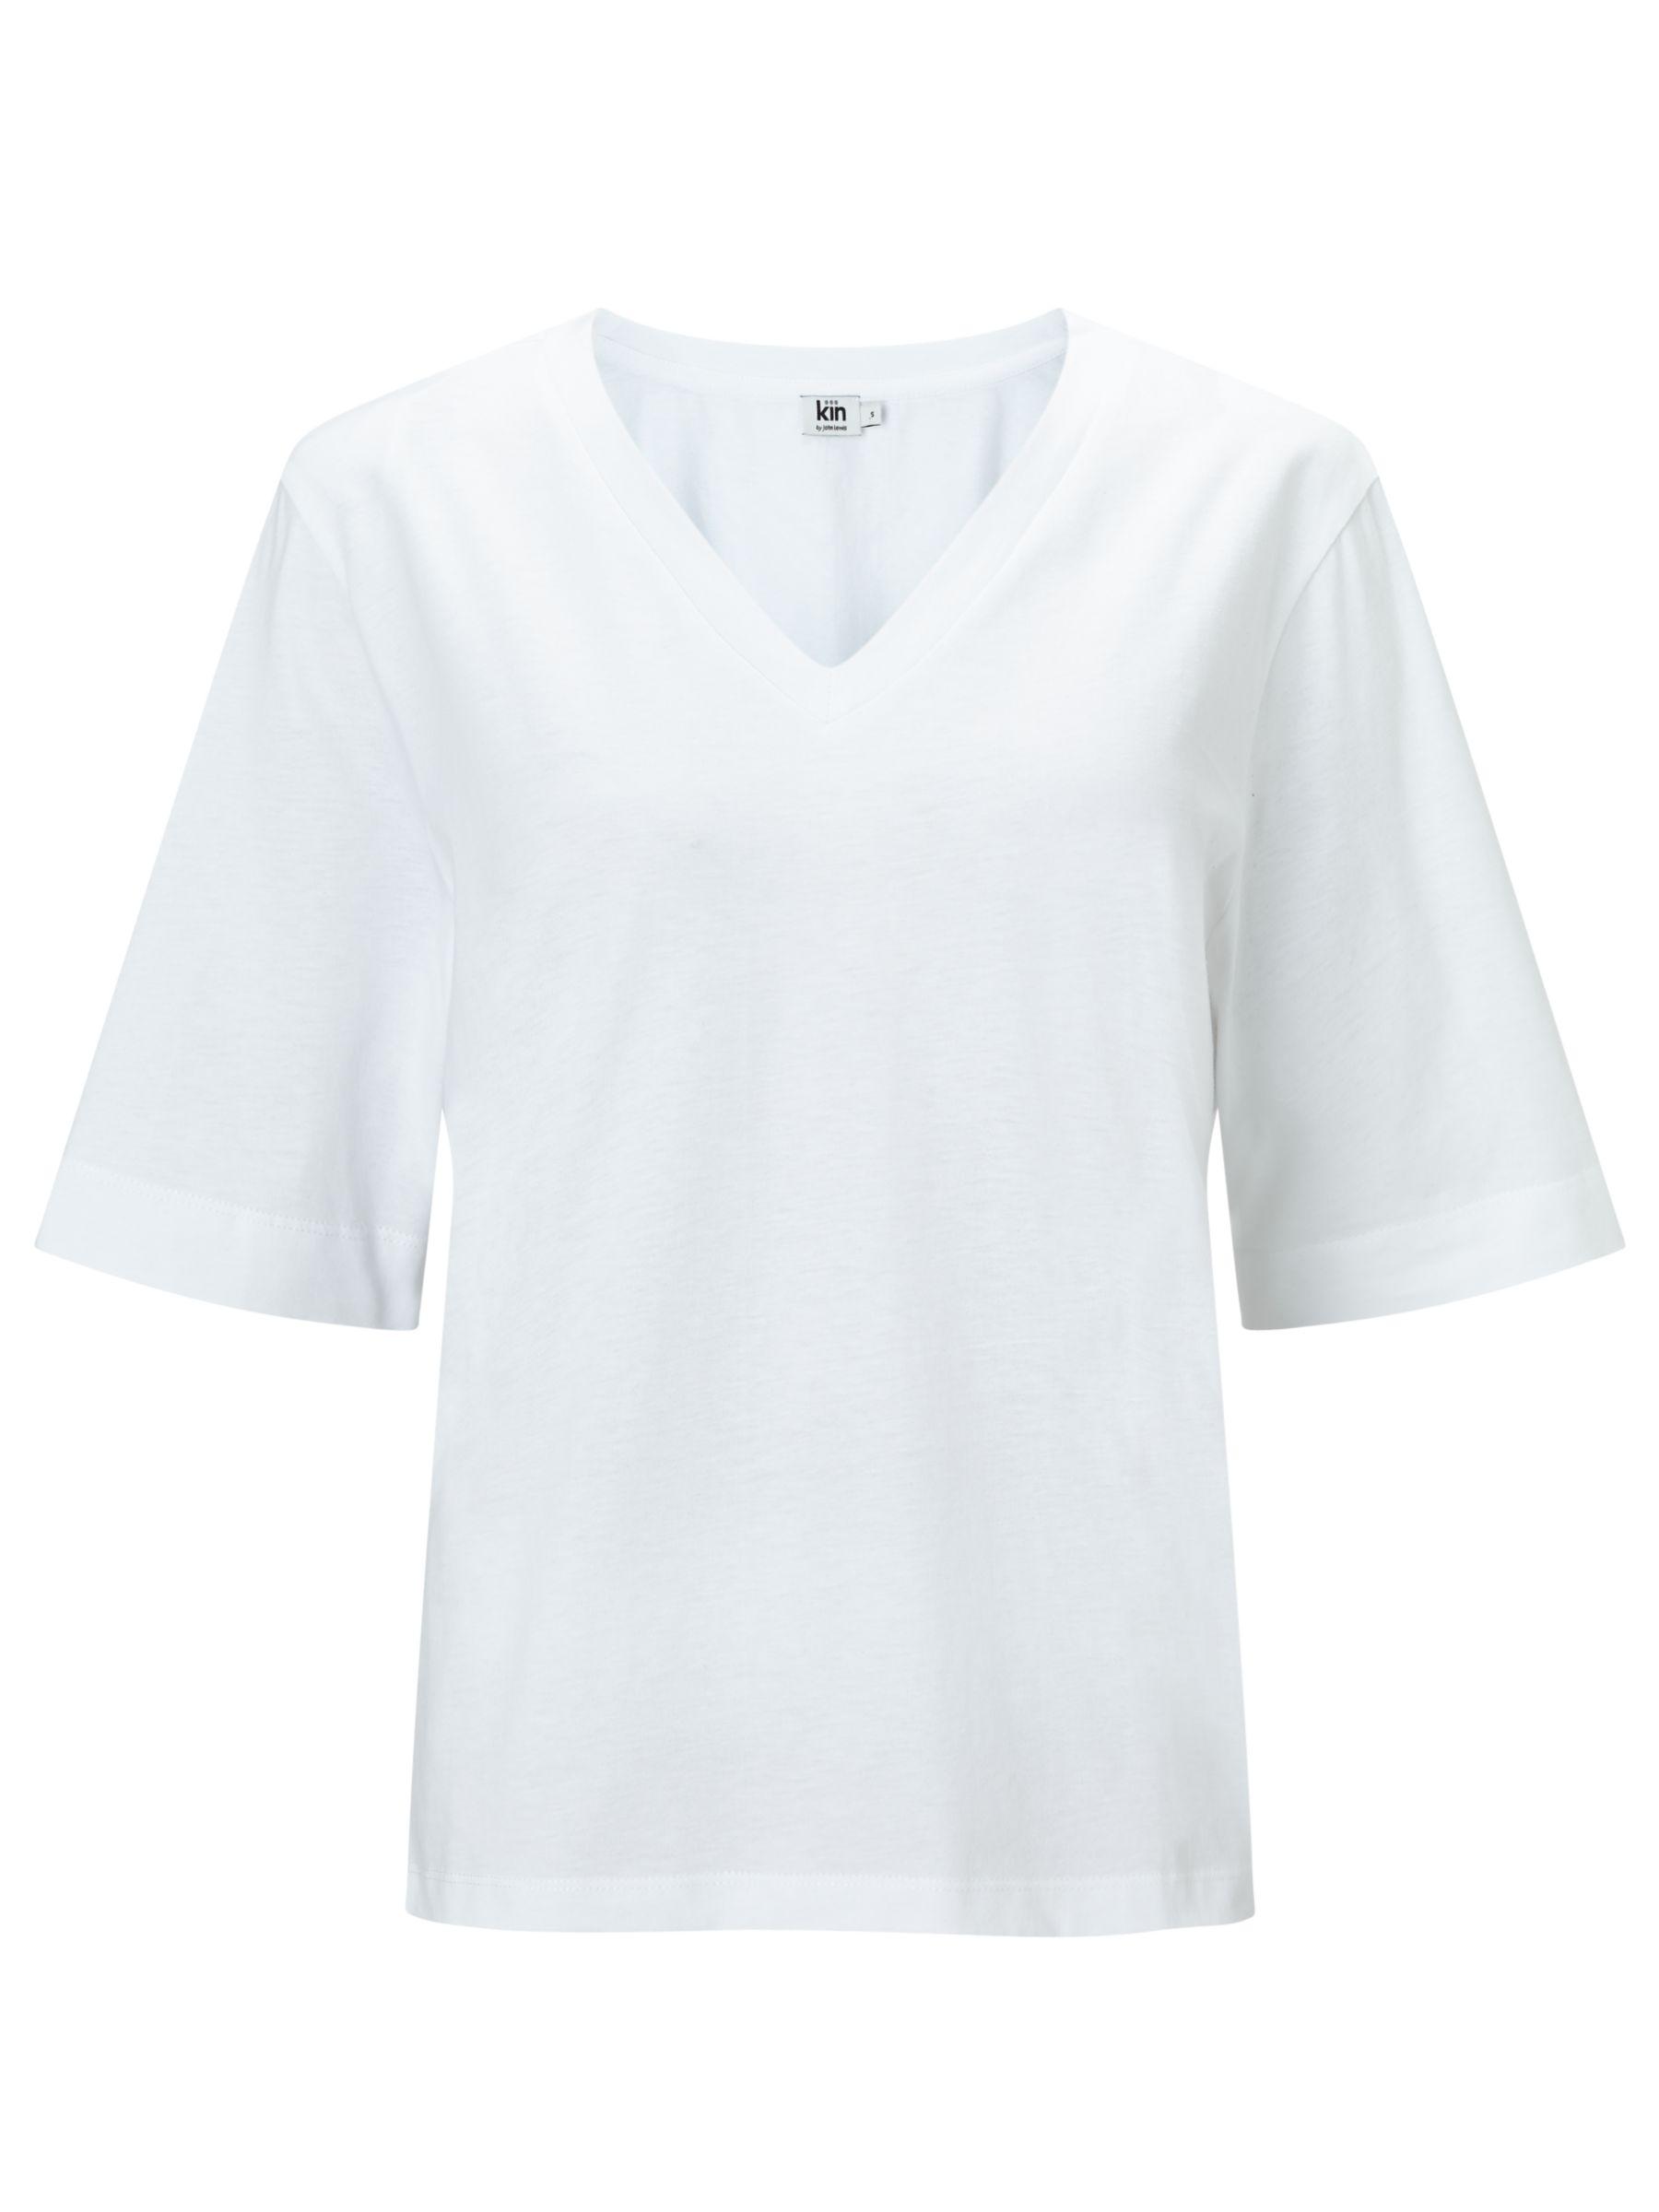 Kin by John Lewis Kin by John Lewis Basic T-Shirt, White